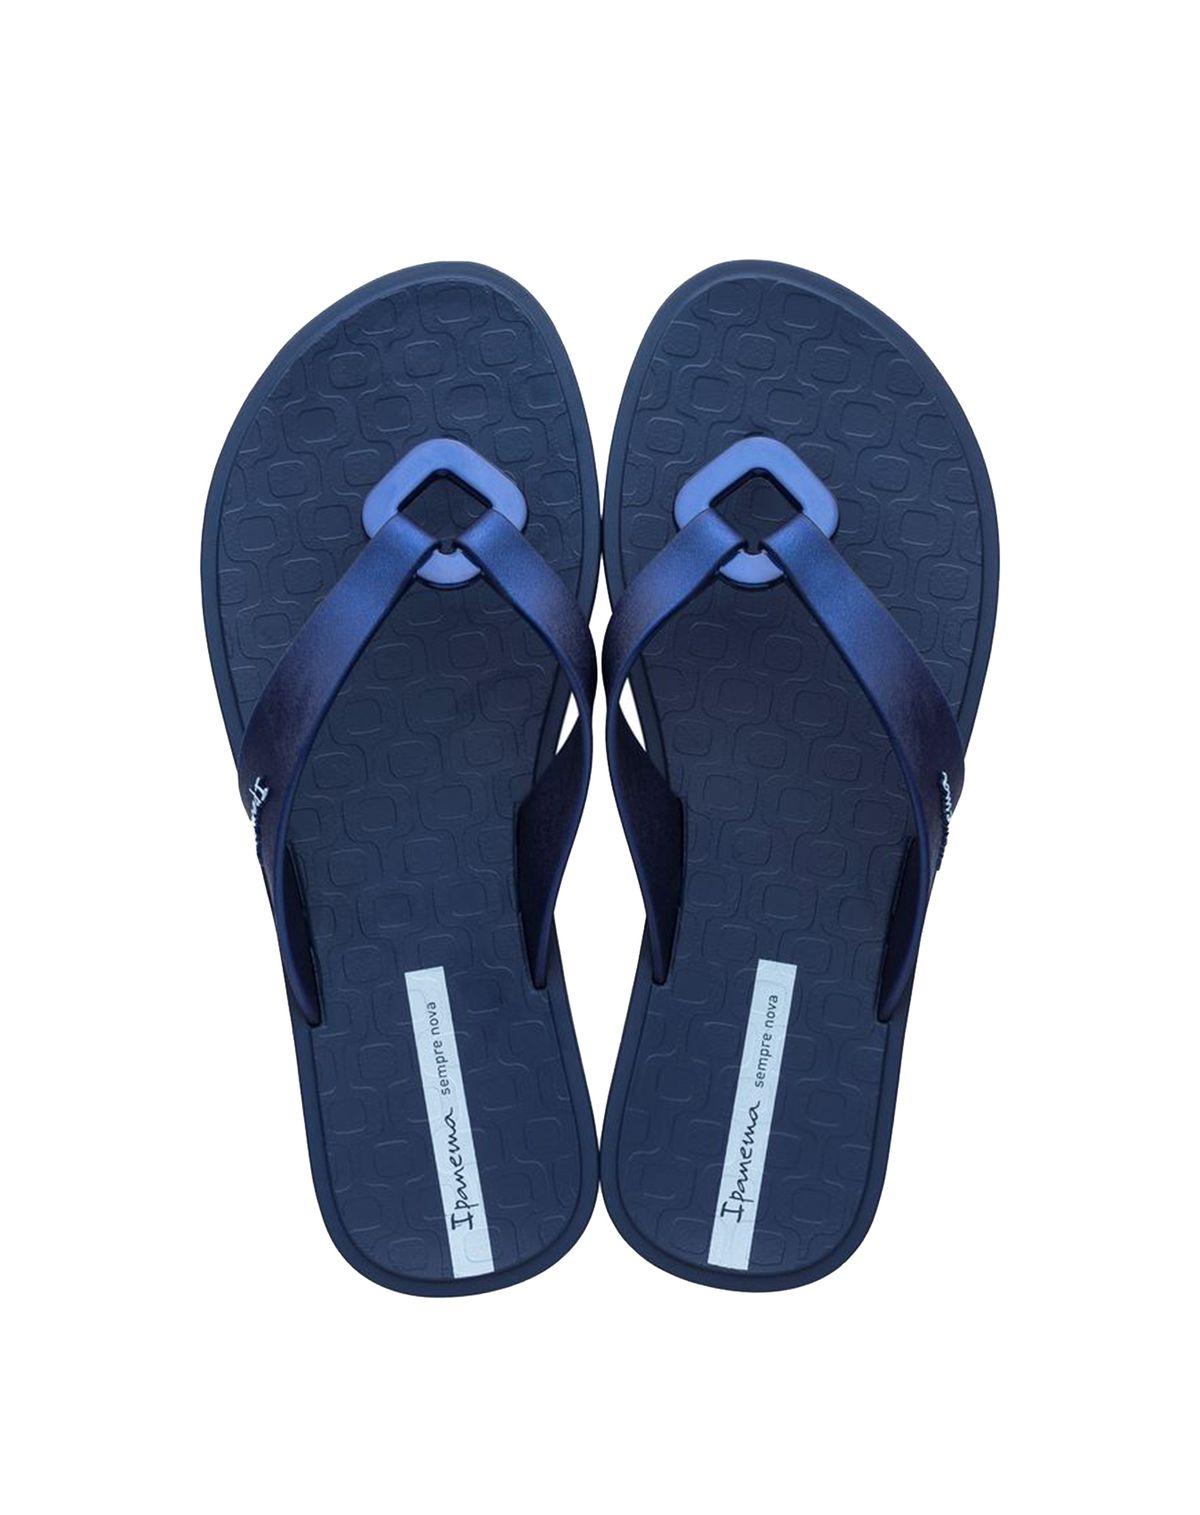 558911049-chinelo-feminino-tira-dedo-ipanema-nexo-azul-perolado-33-4-8c4